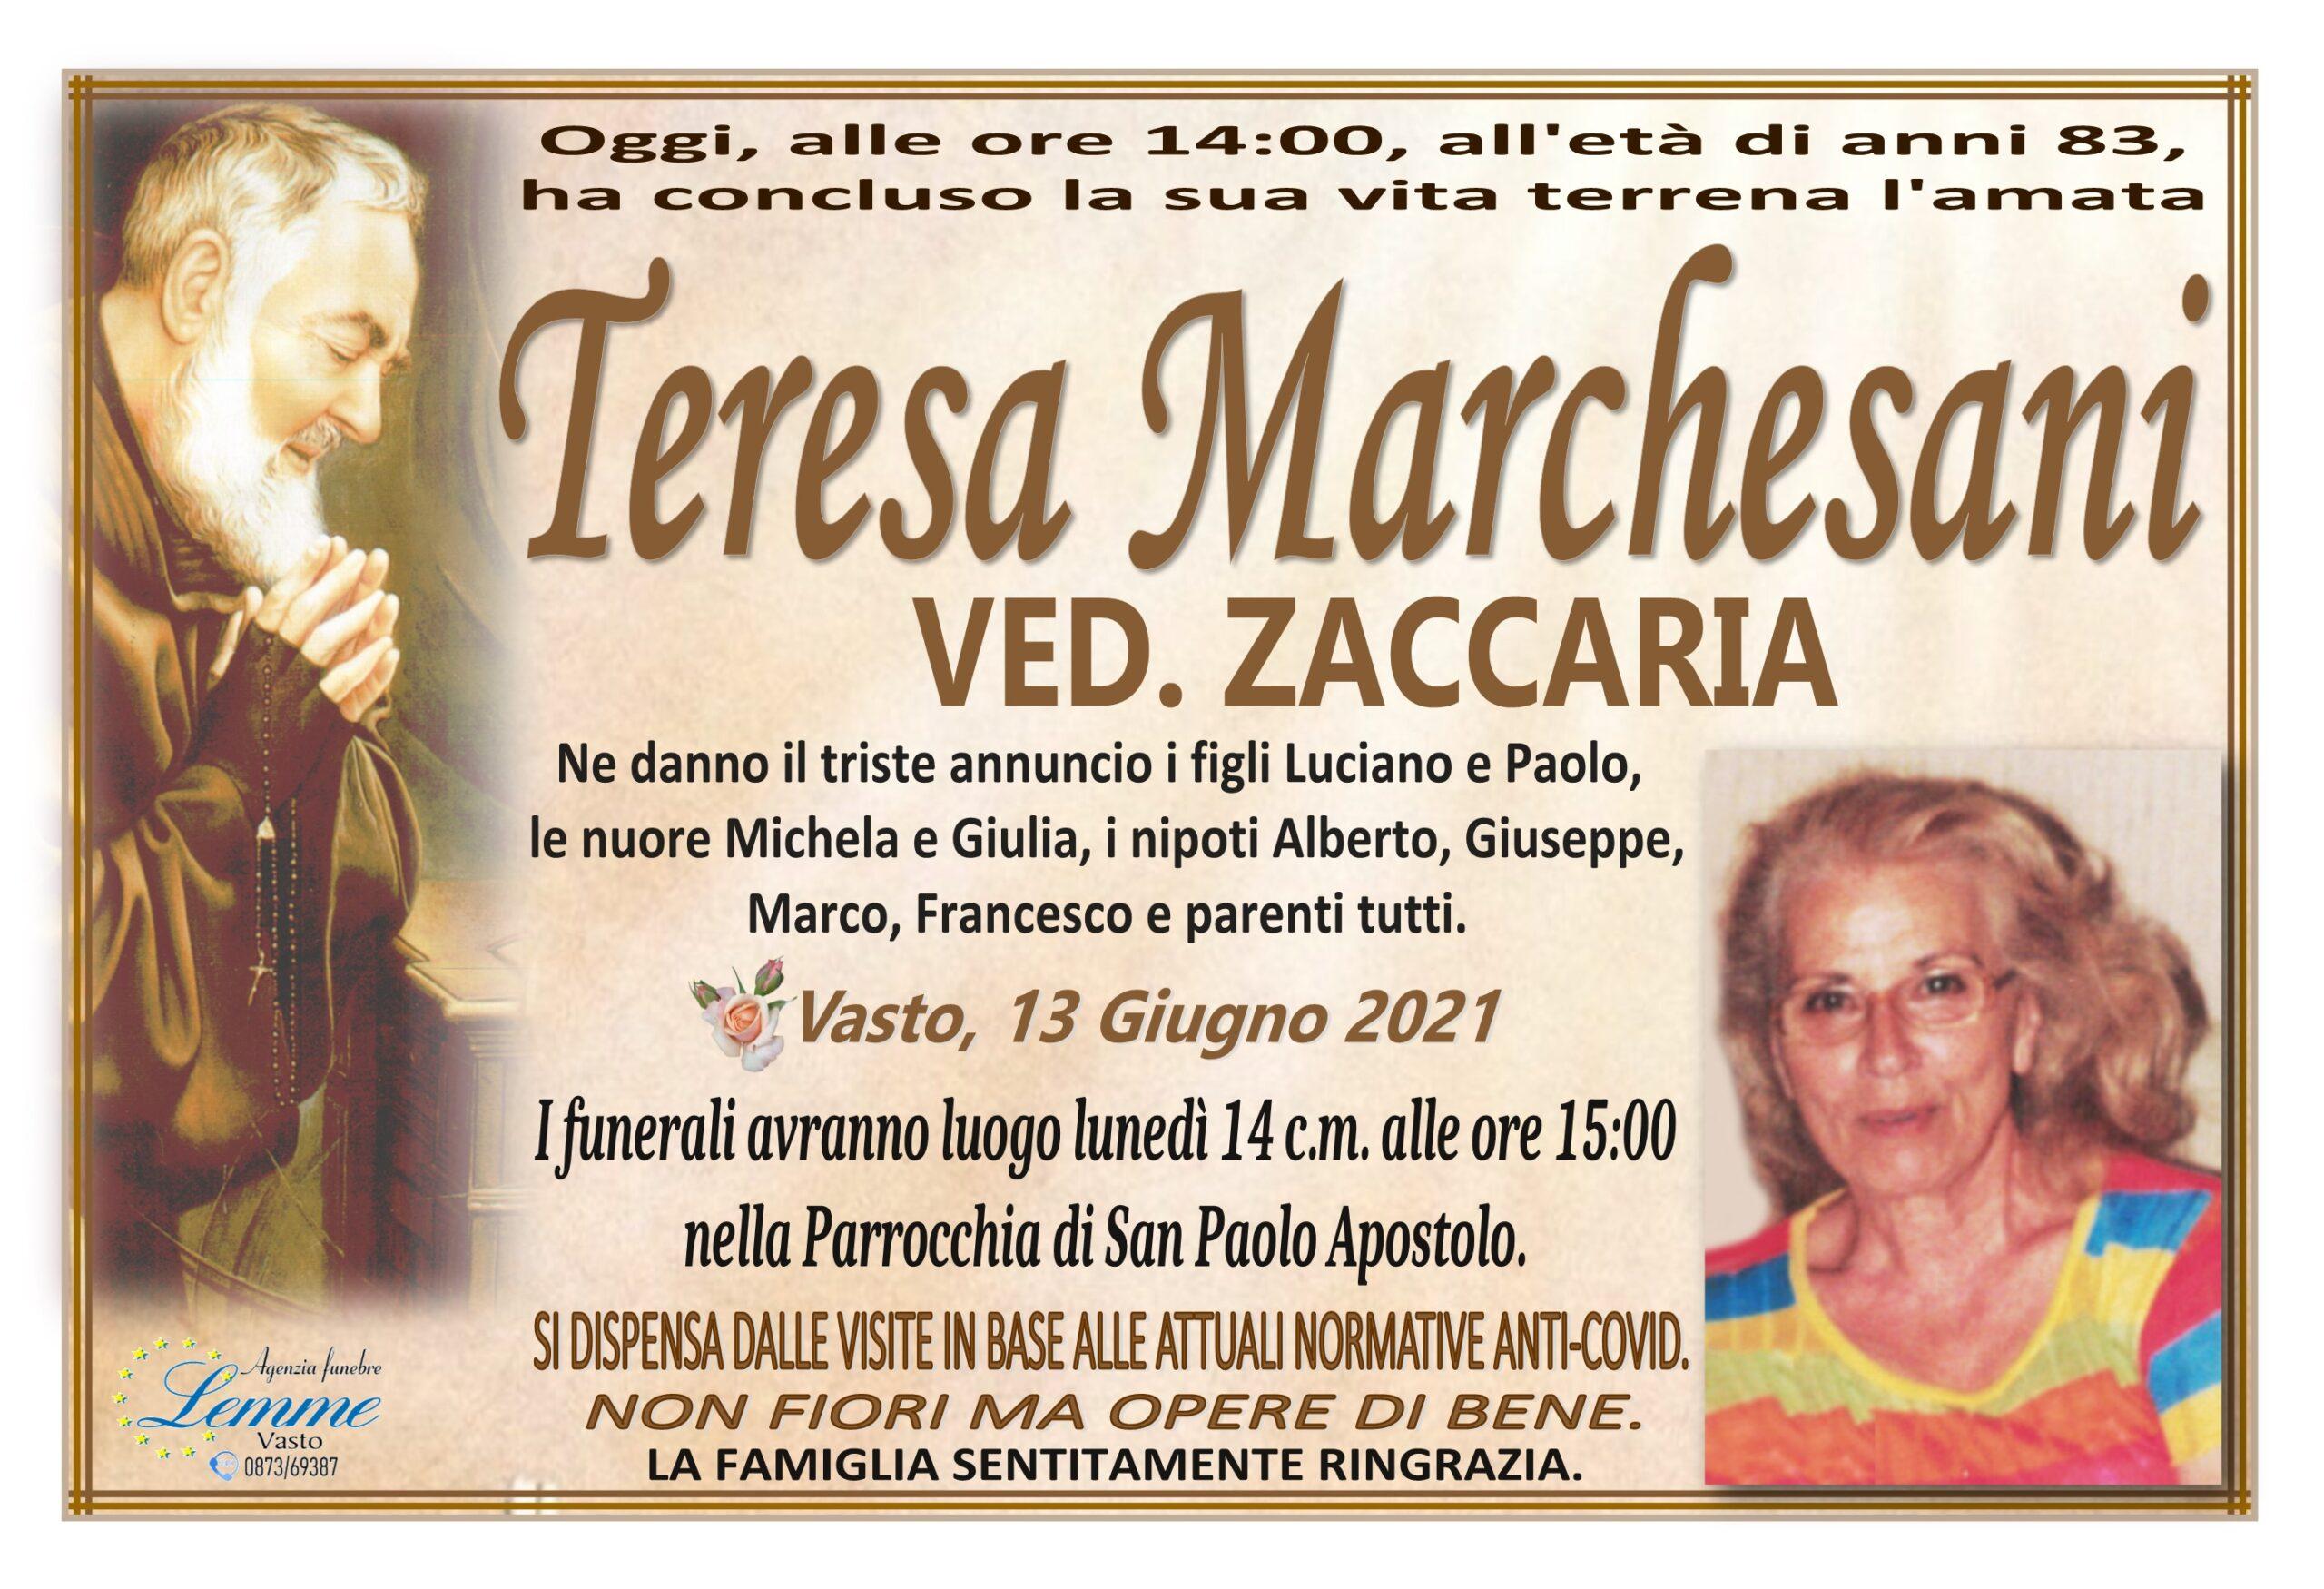 TERESA MARCHESANI